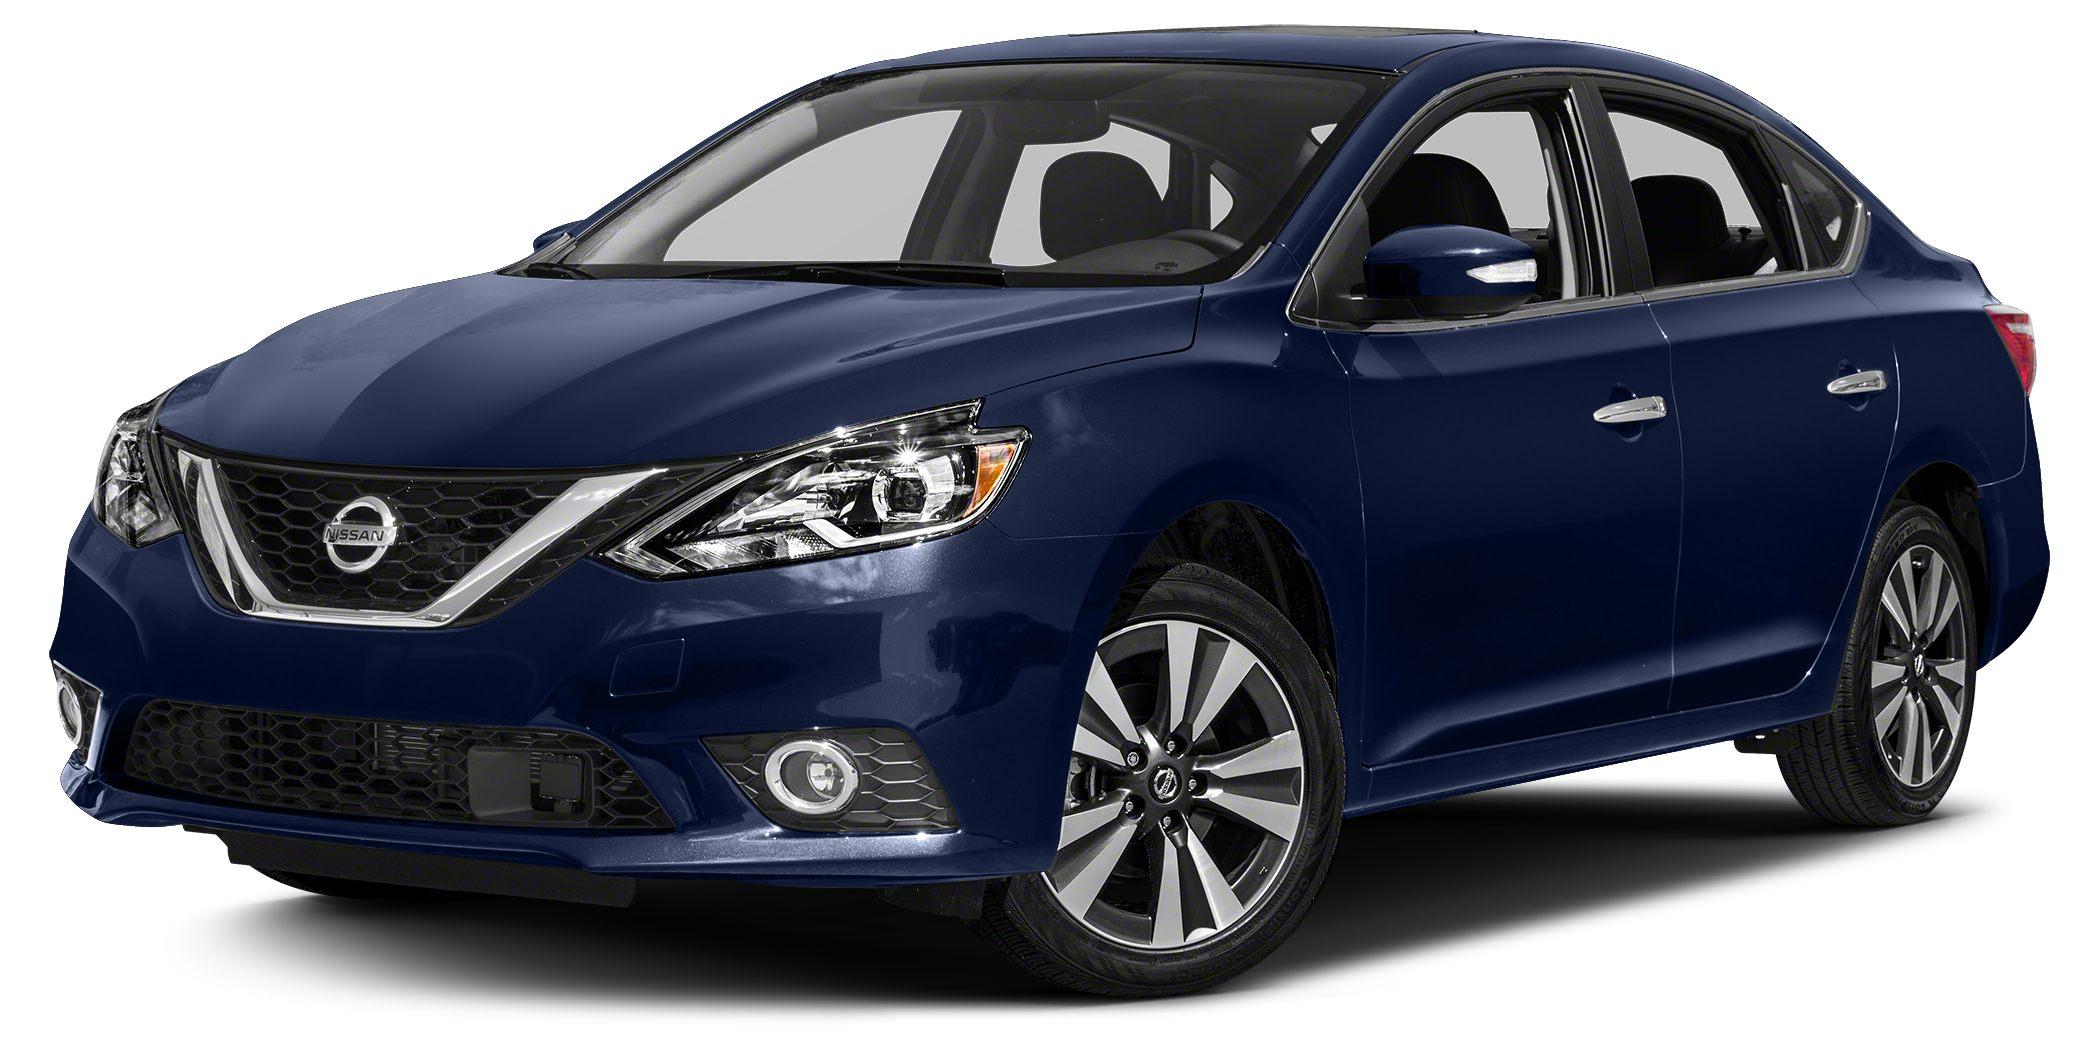 2017 Nissan Sentra SL Miles 277Color Gray Stock U7170349 VIN 3N1AB7AP4HY265320